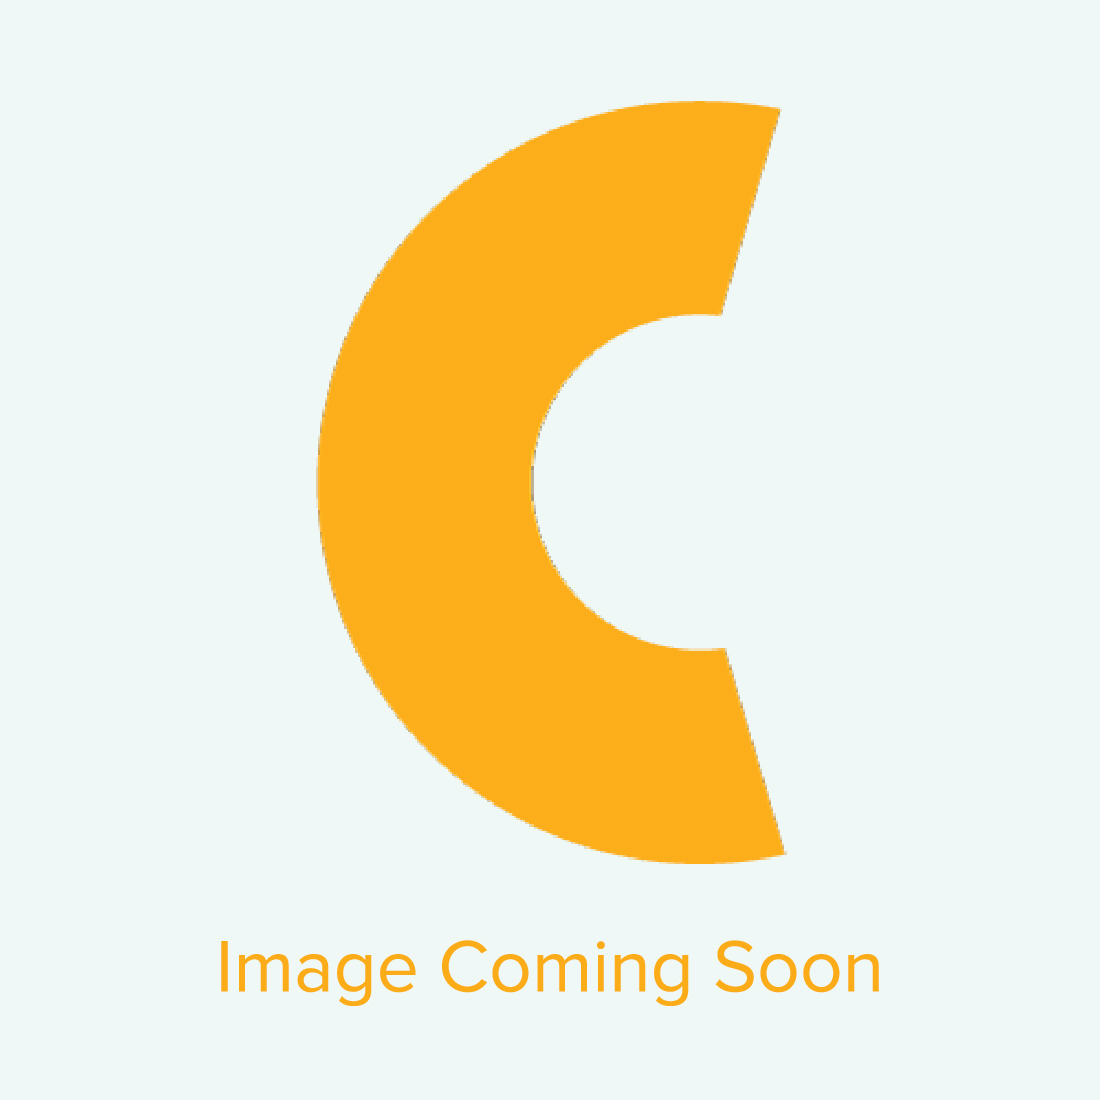 "Epson SureColor F6370 44"" Wide Format Dye Sublimation Standard Edition Printer"